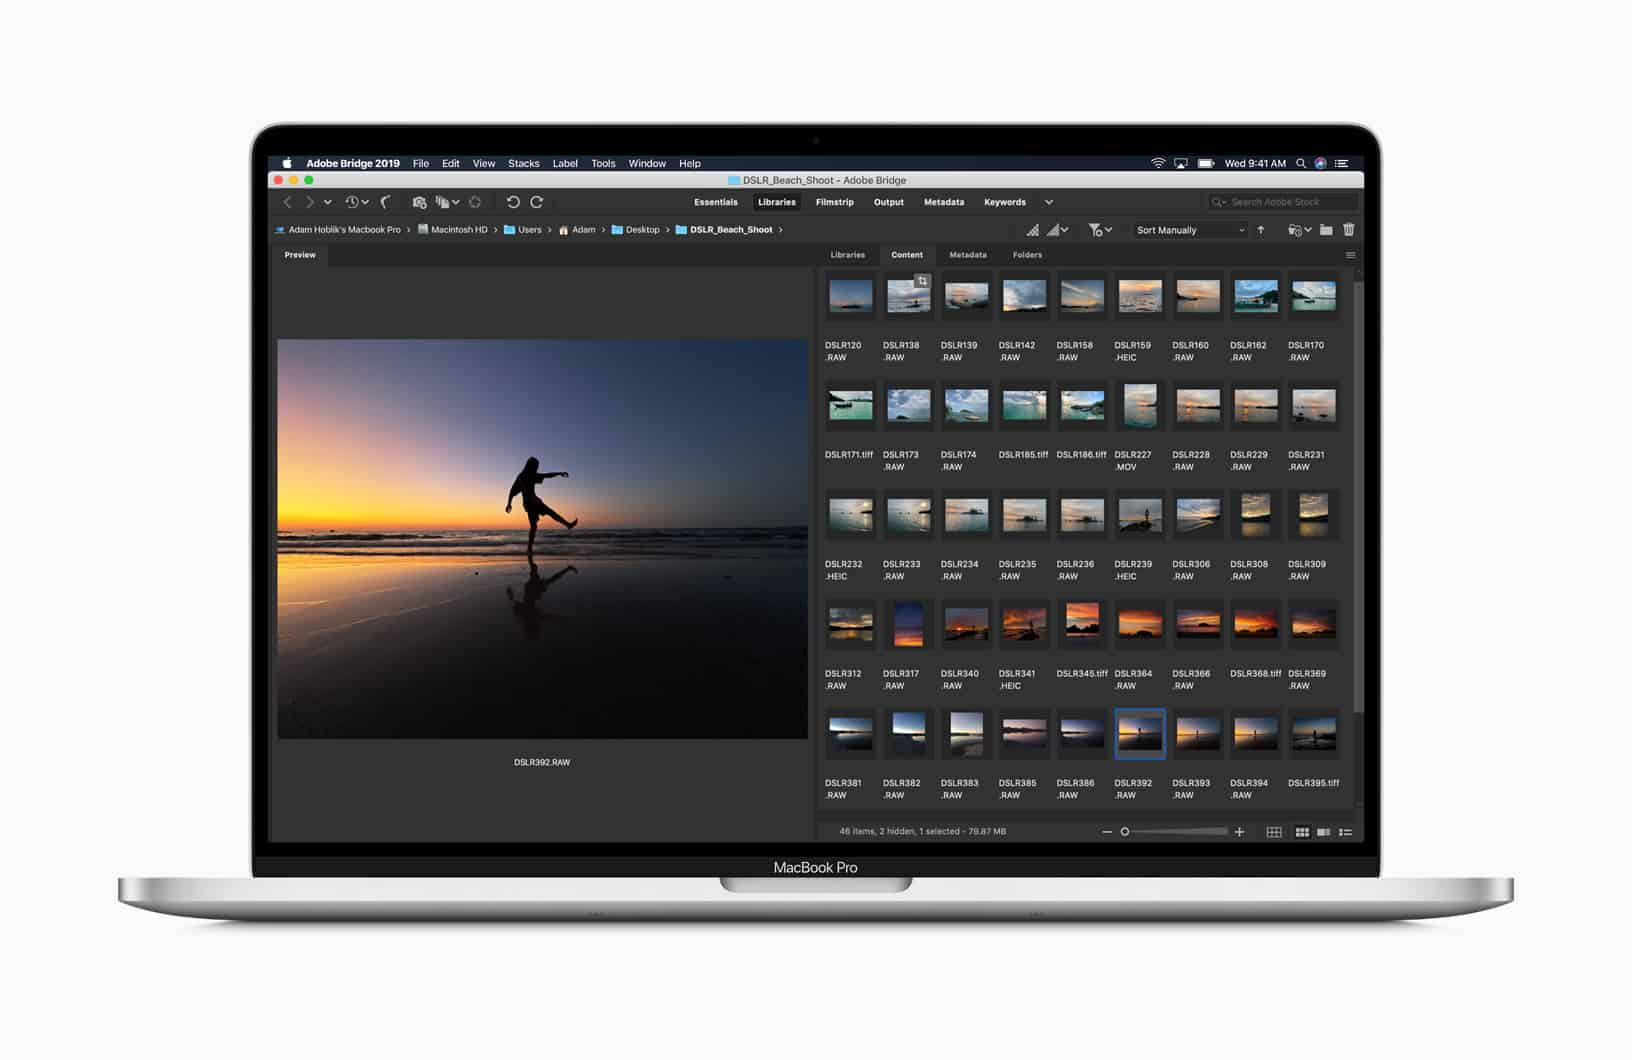 MacOS Cantalina trên MacBook pro 16 inch MVVK2